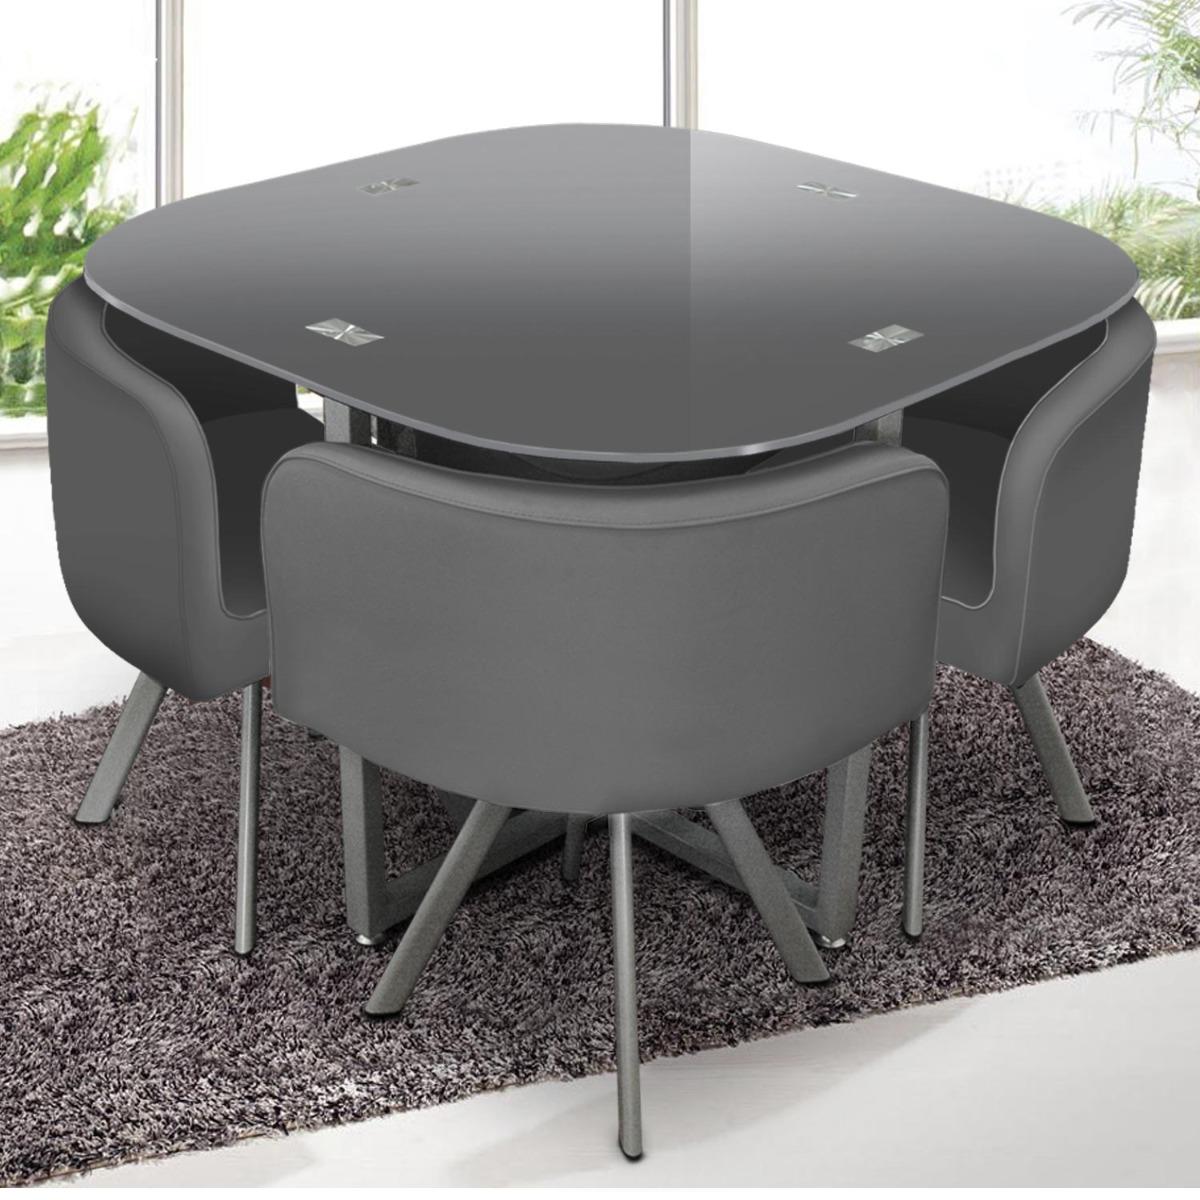 Mosaic 90 grijze tafel en stoelen